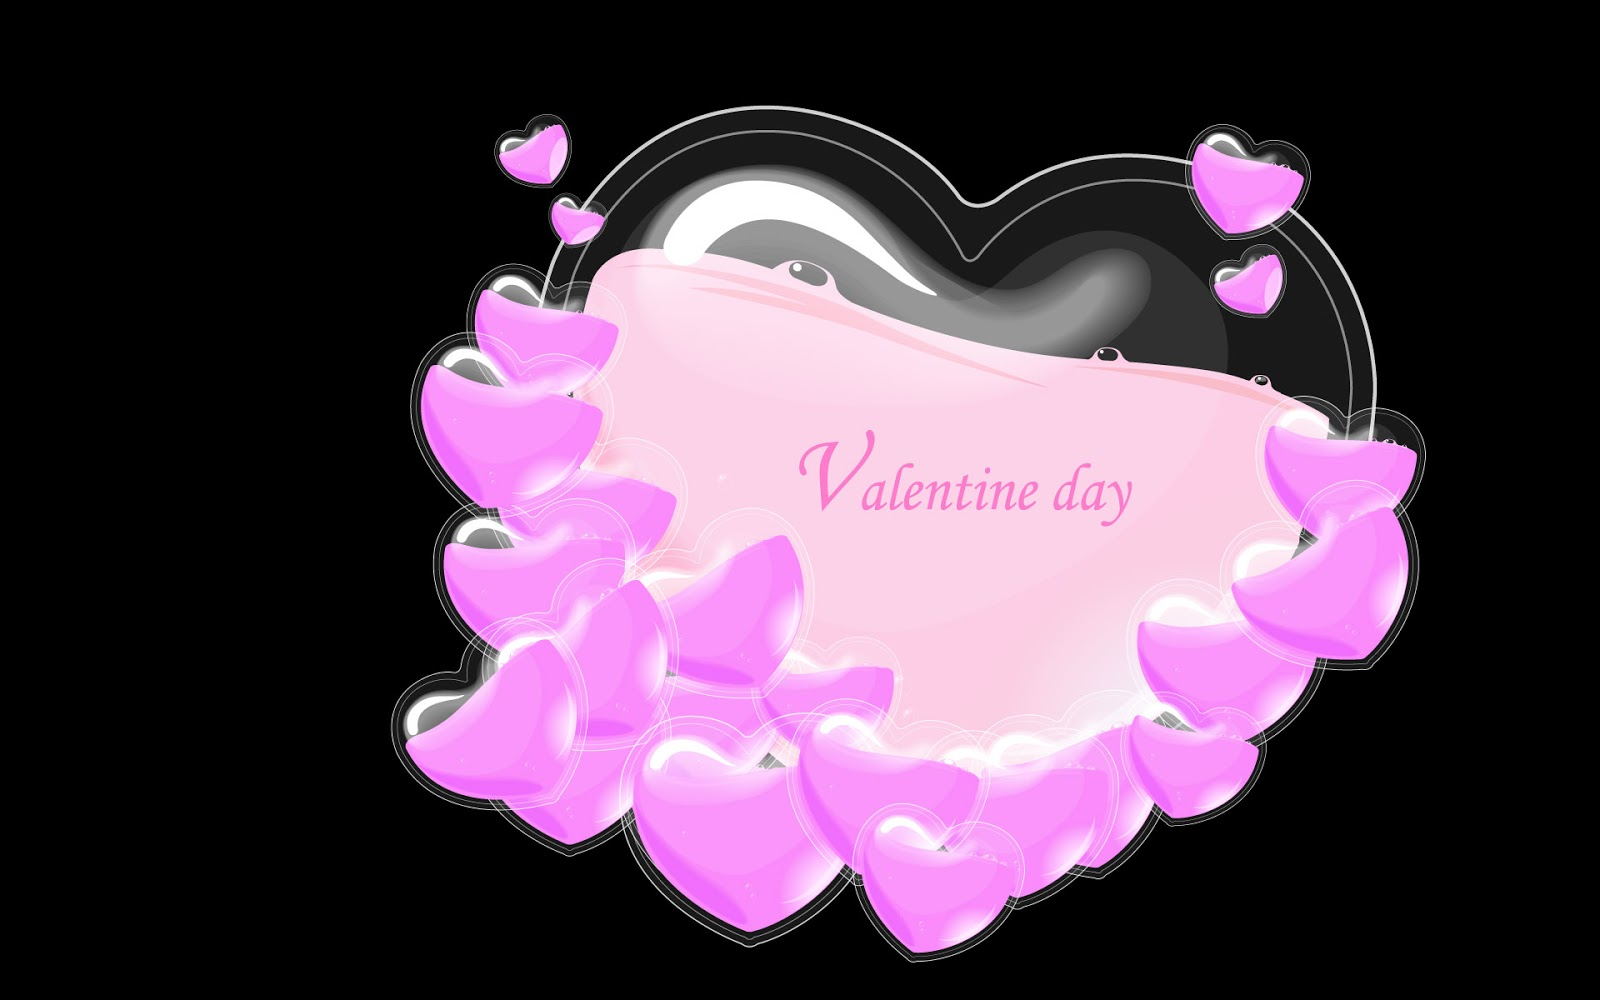 http://2.bp.blogspot.com/-8pPRCCePL50/UPbEY7YF8MI/AAAAAAAACC0/jcH_5MqphMU/s1600/valentines+day+decstop+backgrounds+(6).jpg